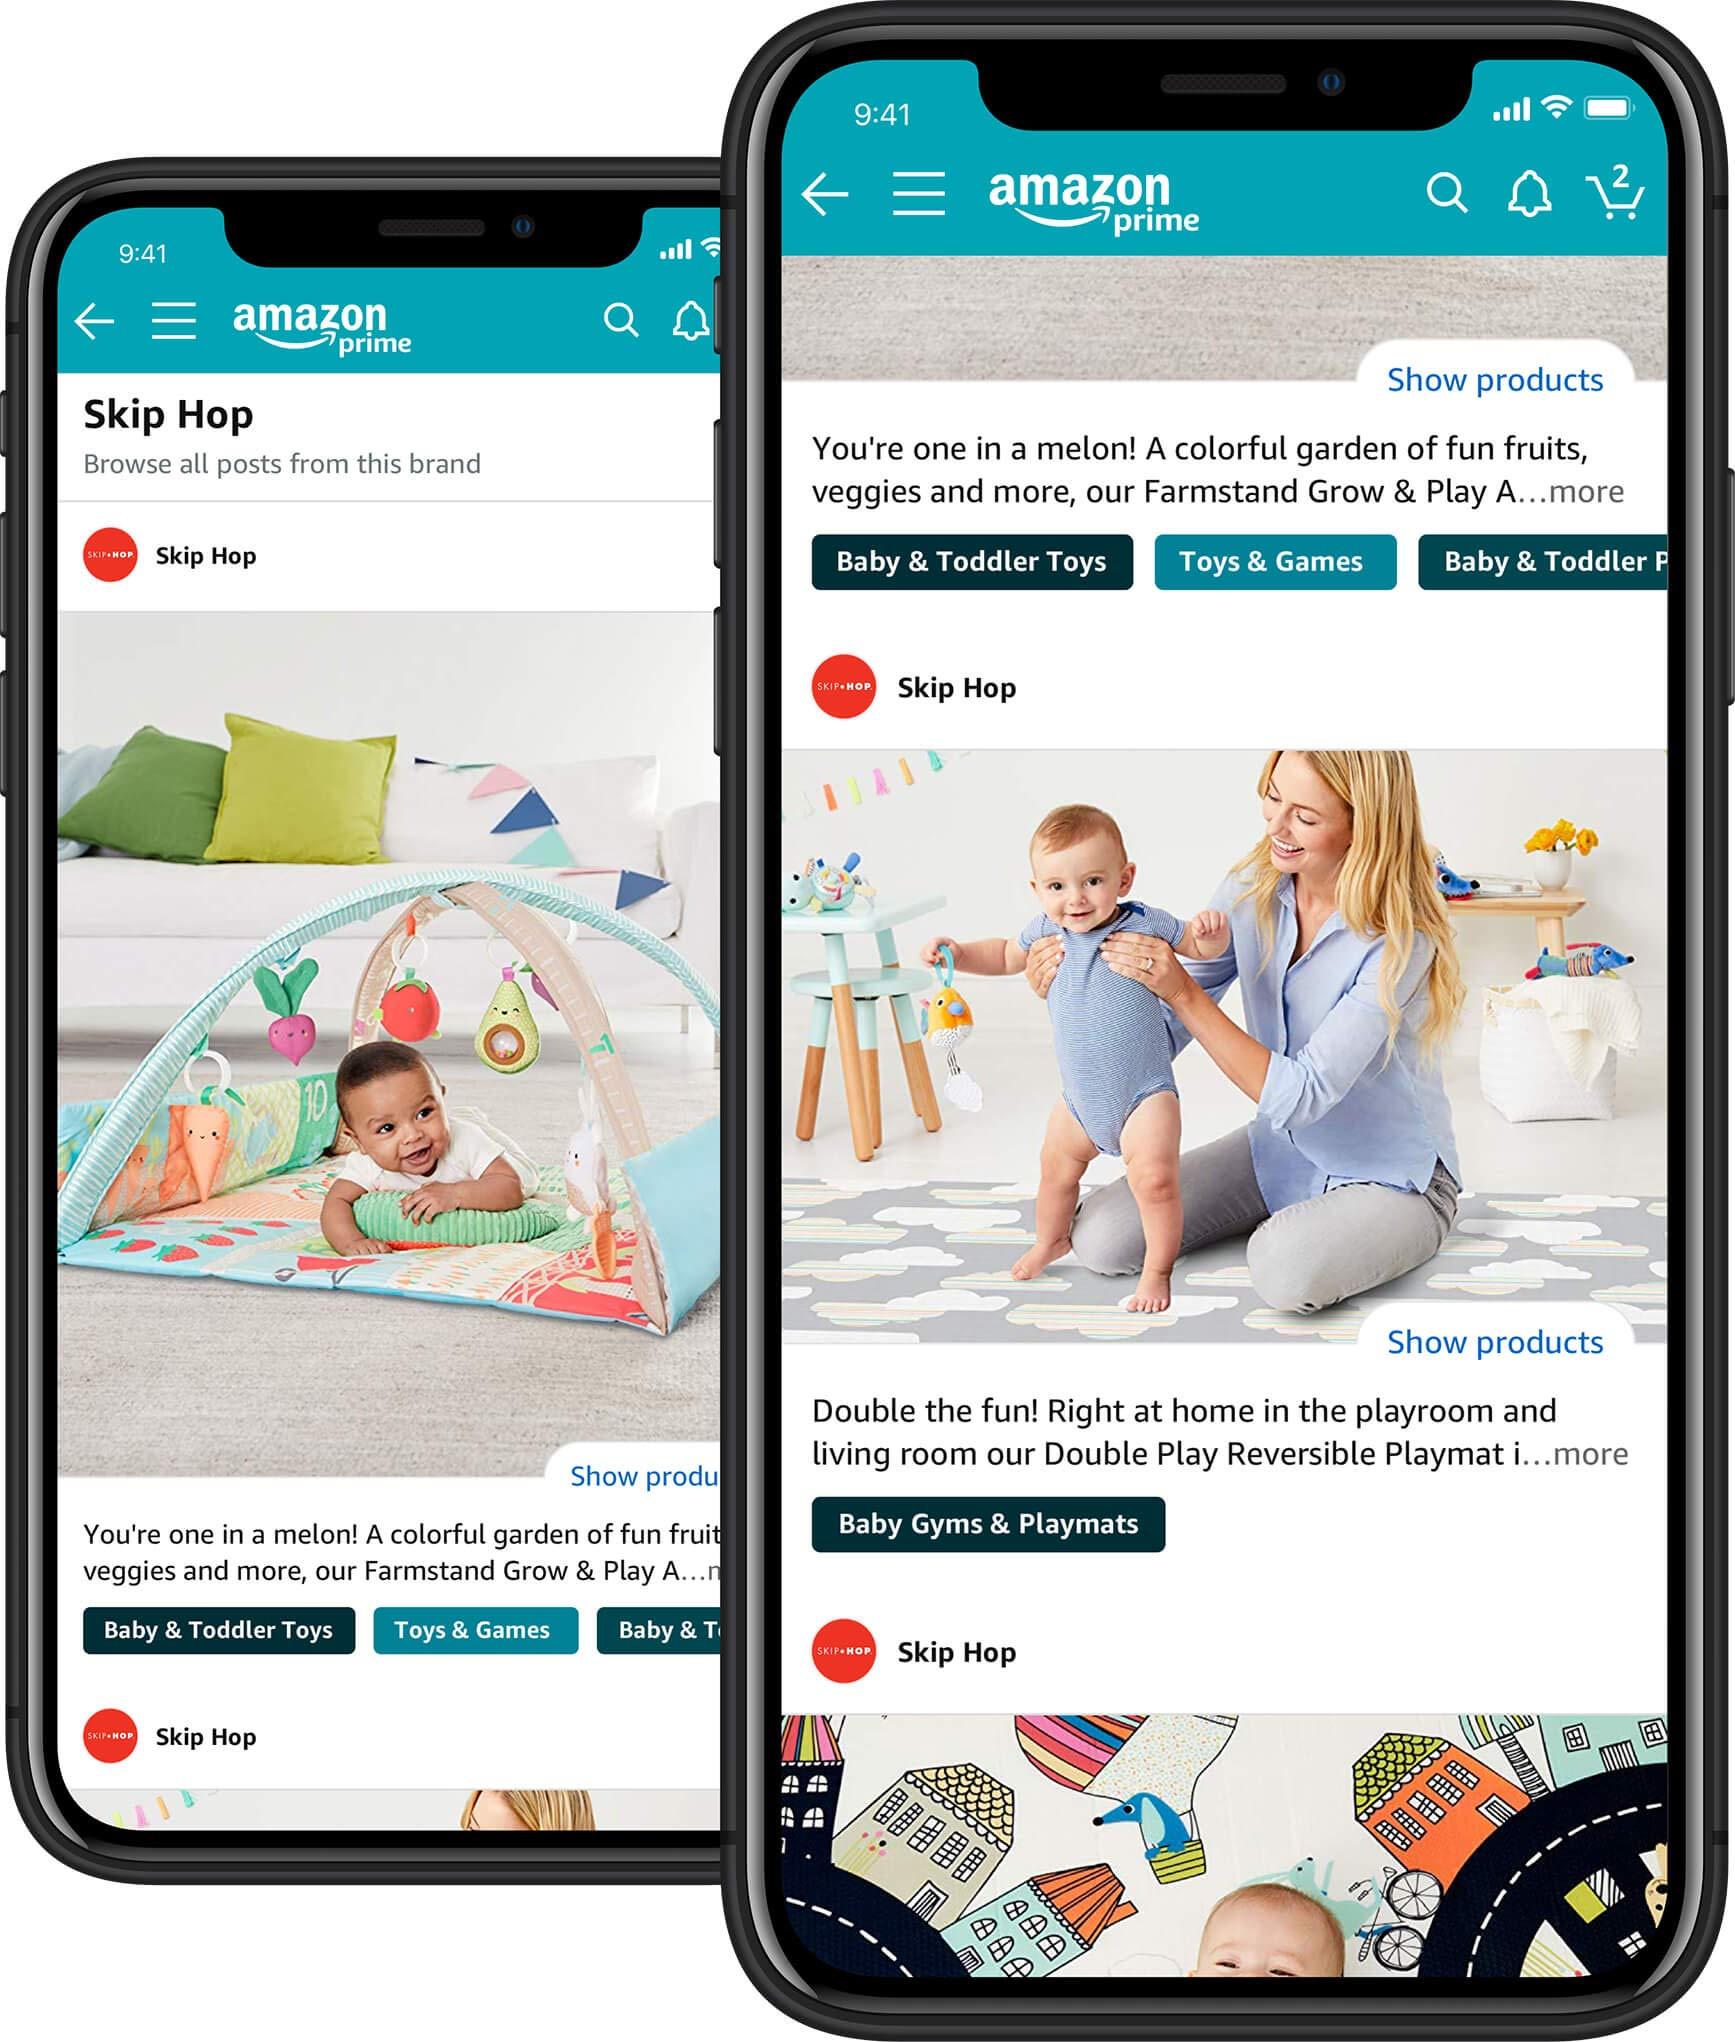 Posts (beta) – Image-led browsing on Amazon | Amazon Advertising